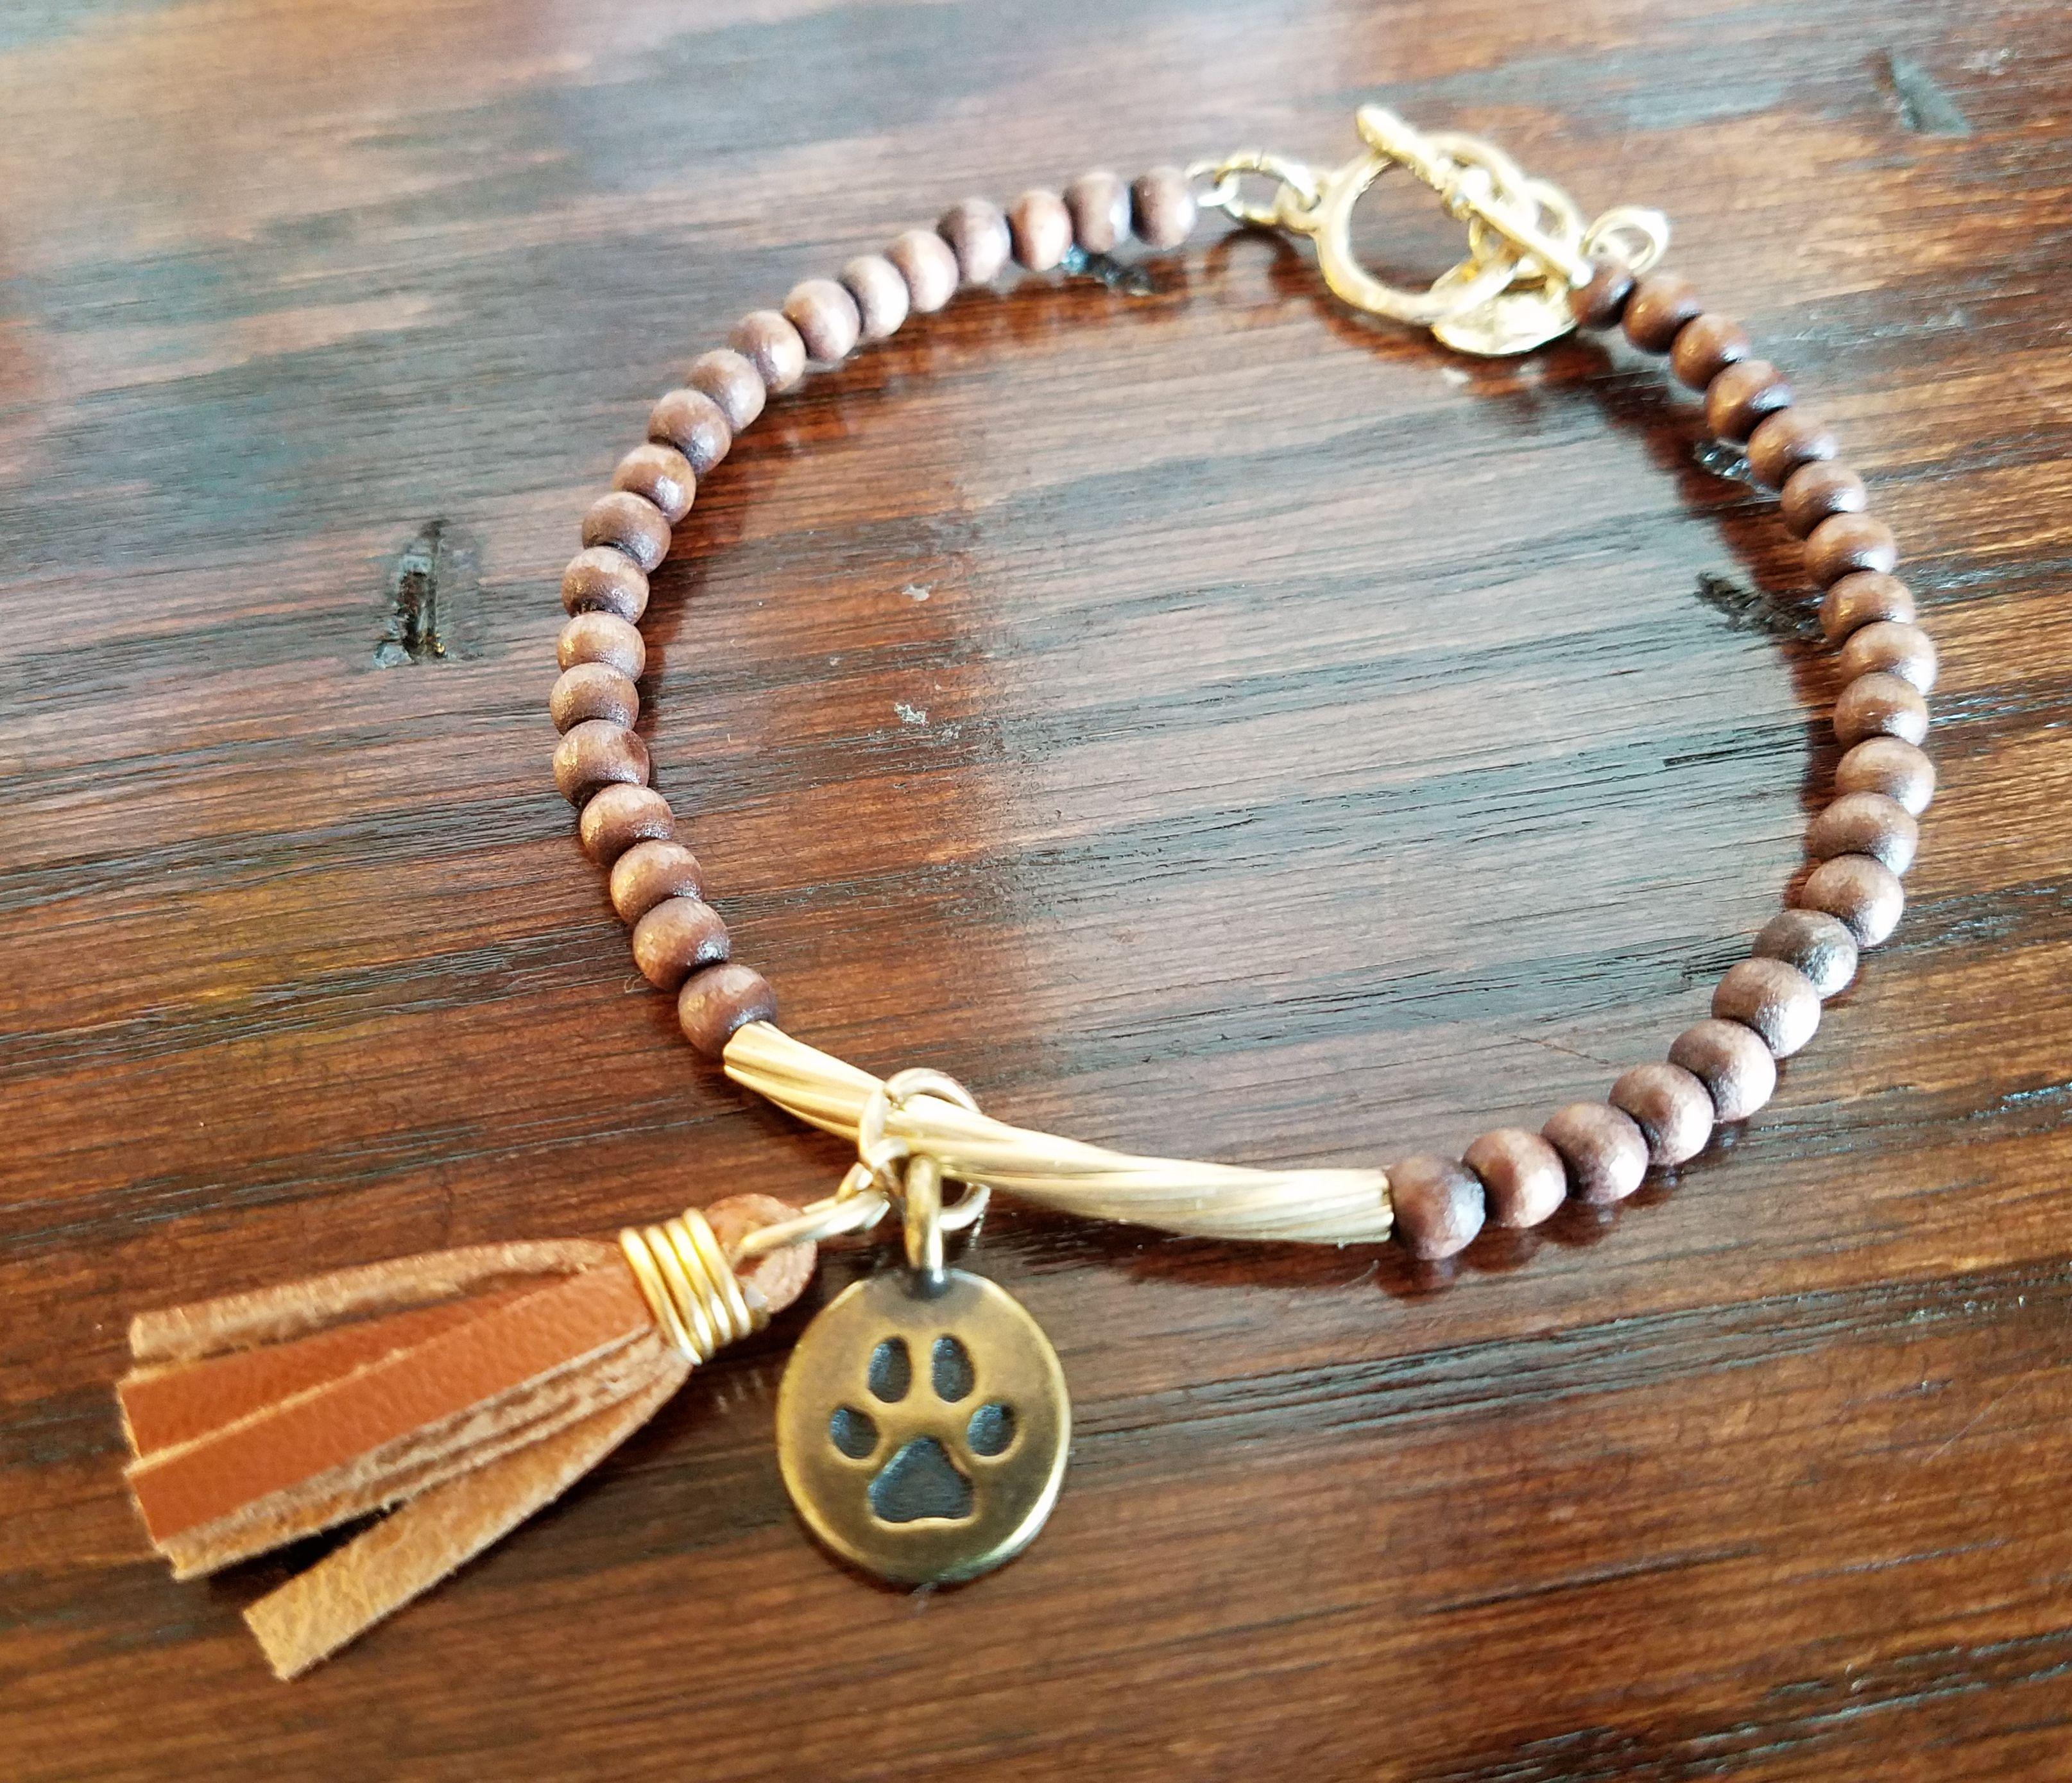 Pin by MARKET 22 on Market 22 Style Bead charm bracelet